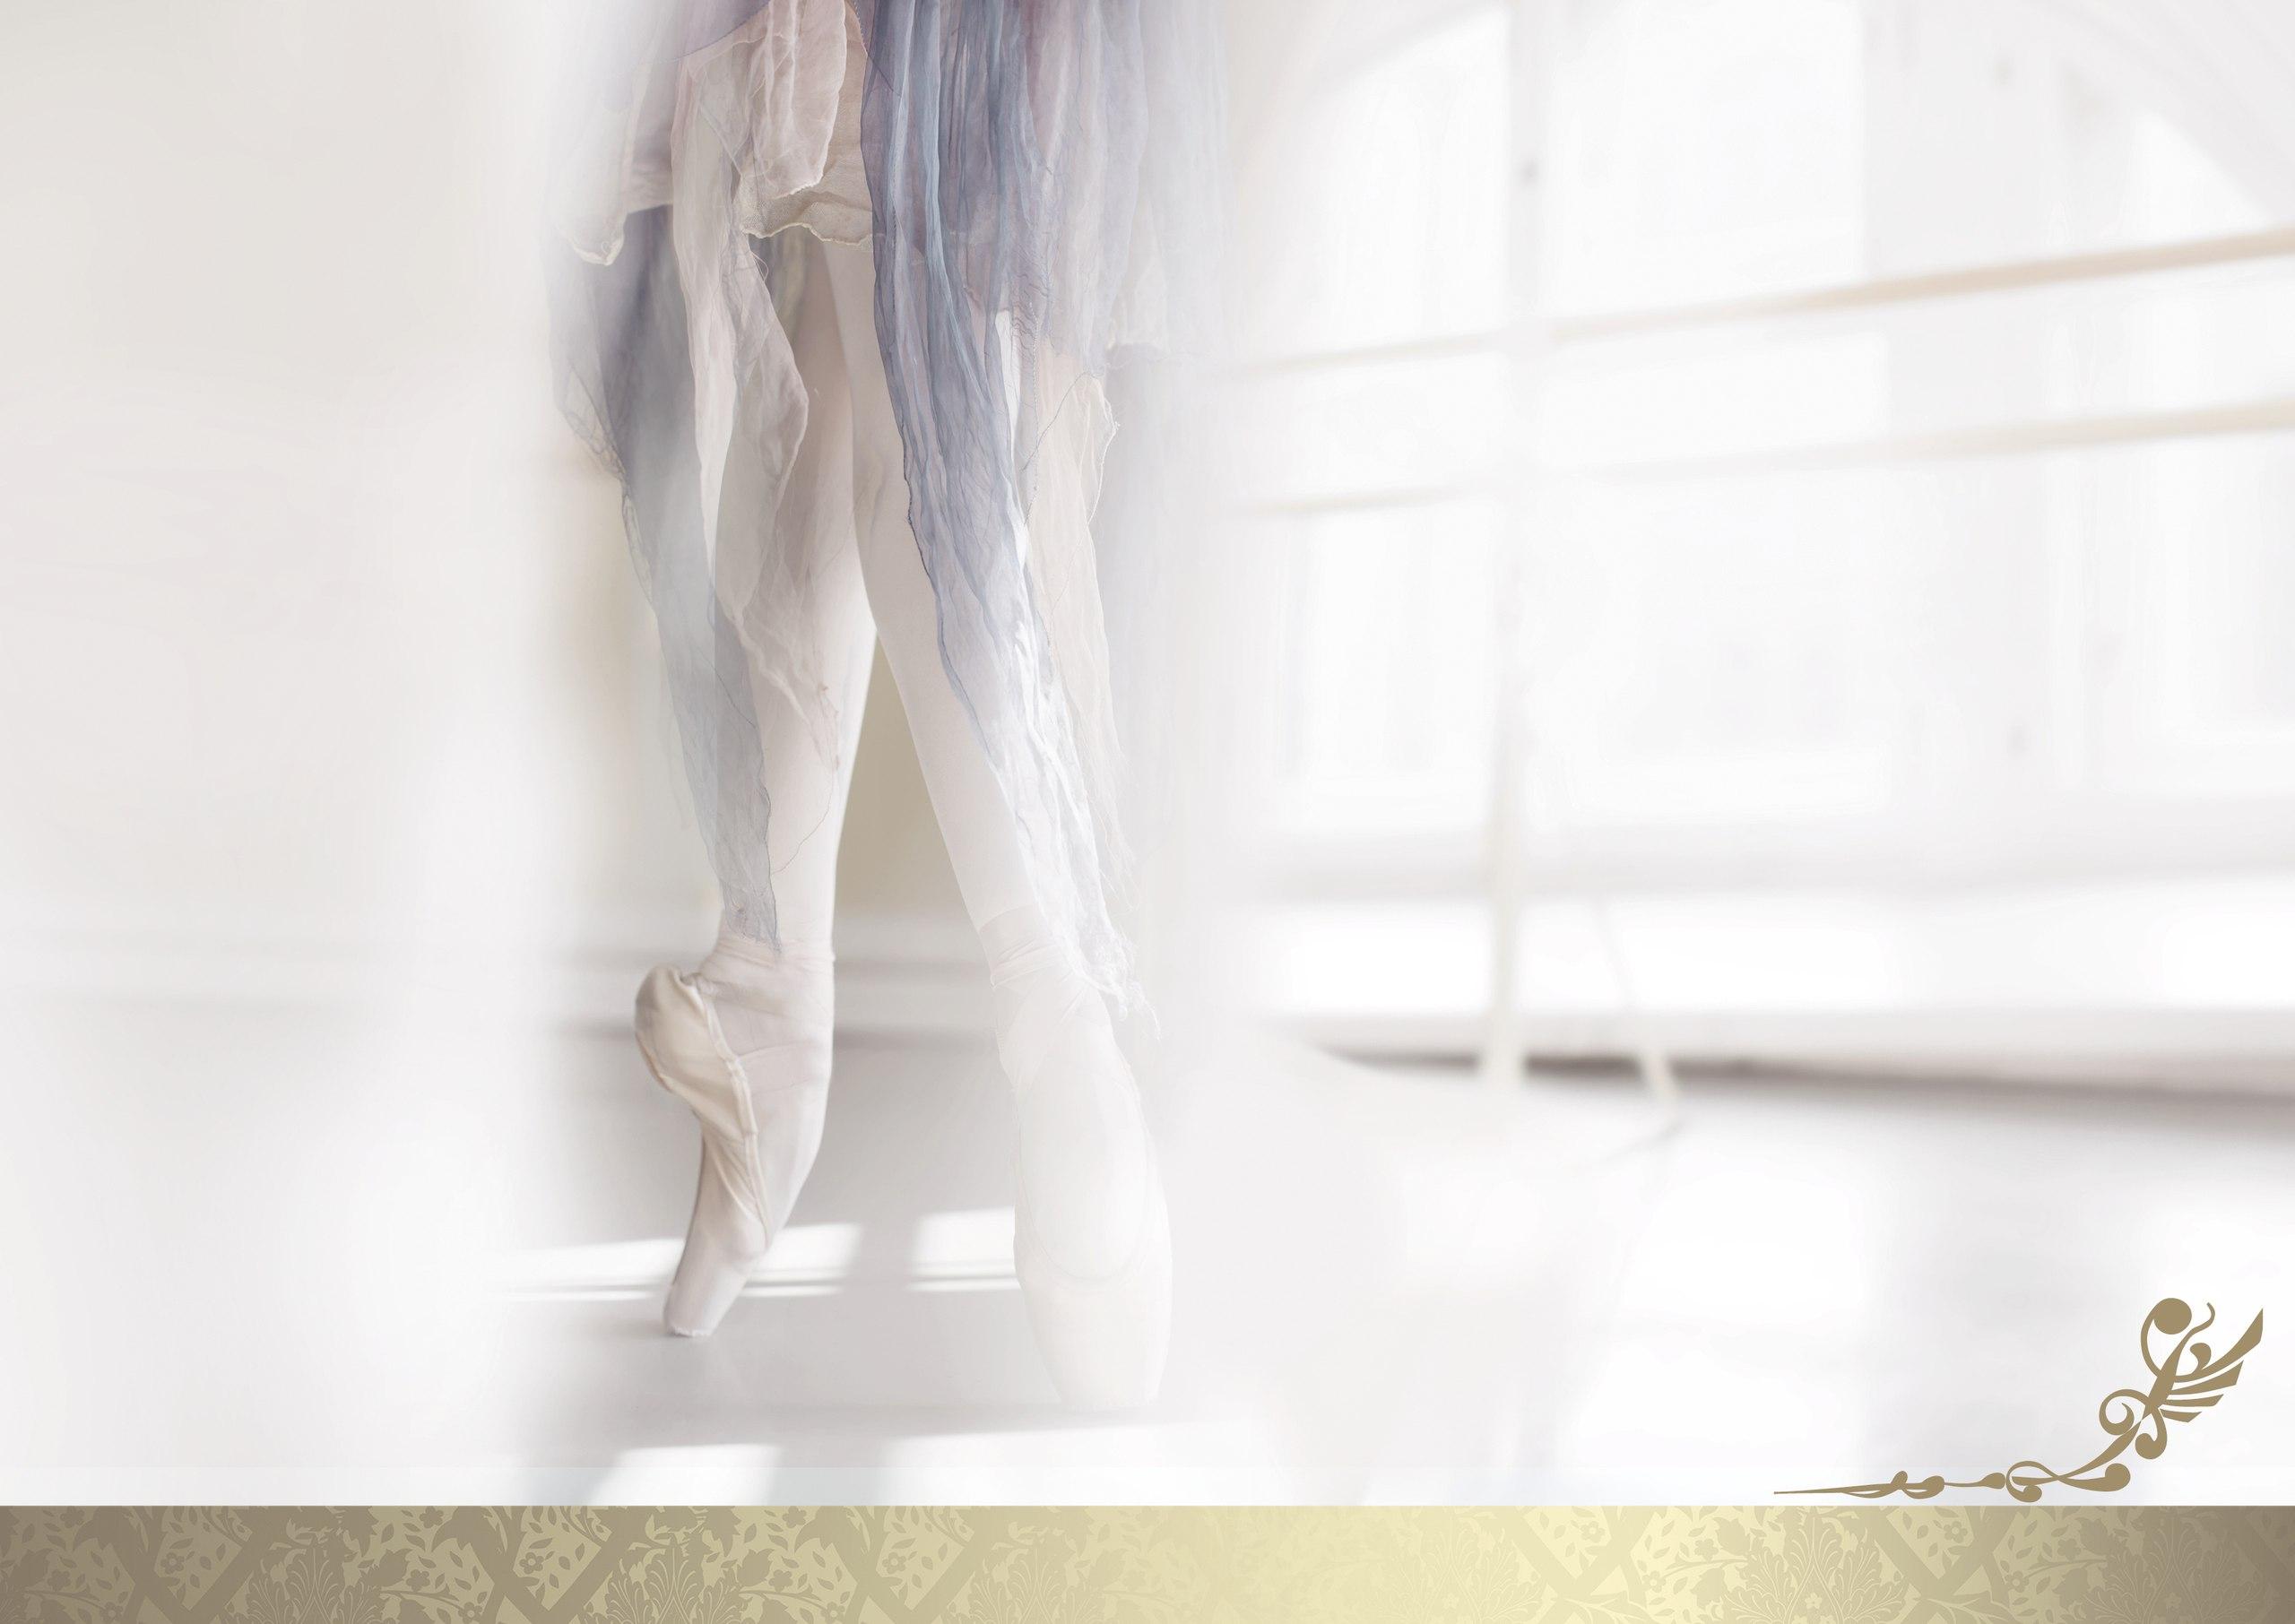 Академия русского балета 2014.jpg